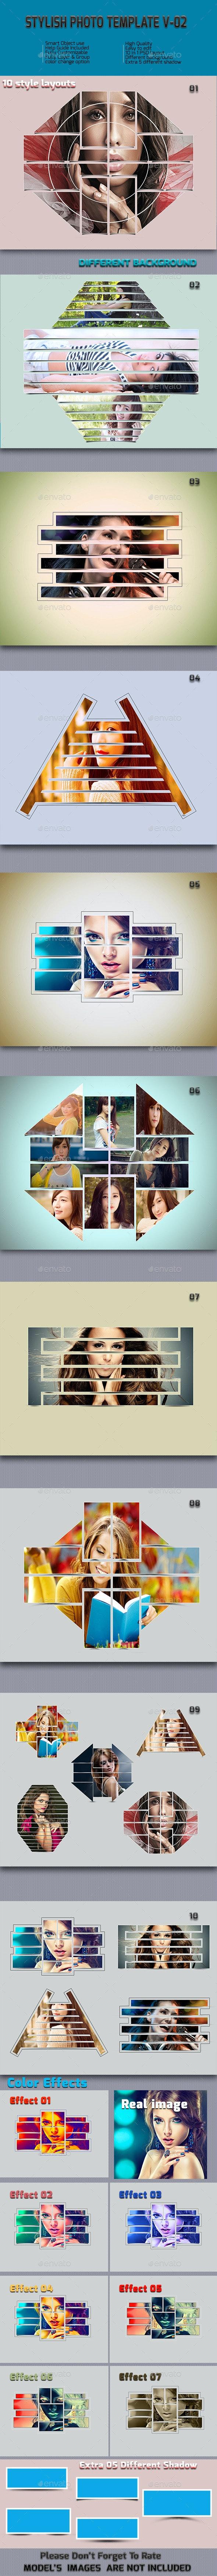 Stylish Photo  Frame Templates V-02 - Miscellaneous Photo Templates